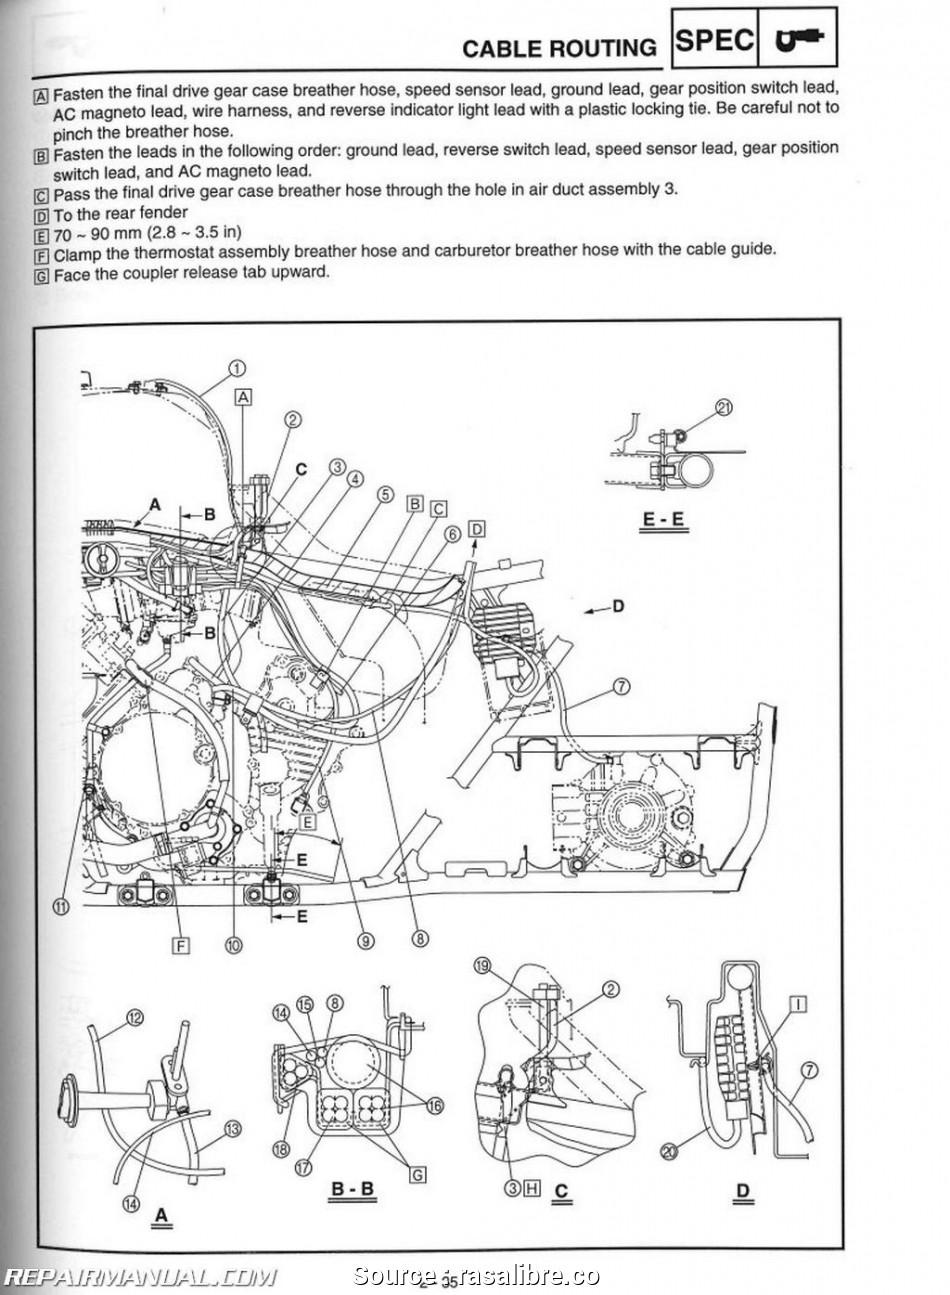 GE_1829] Wiring Diagram 2011 450 Yamaha Grizzly Free DiagramExpe Caba Vira Birdem Inama Mohammedshrine Librar Wiring 101